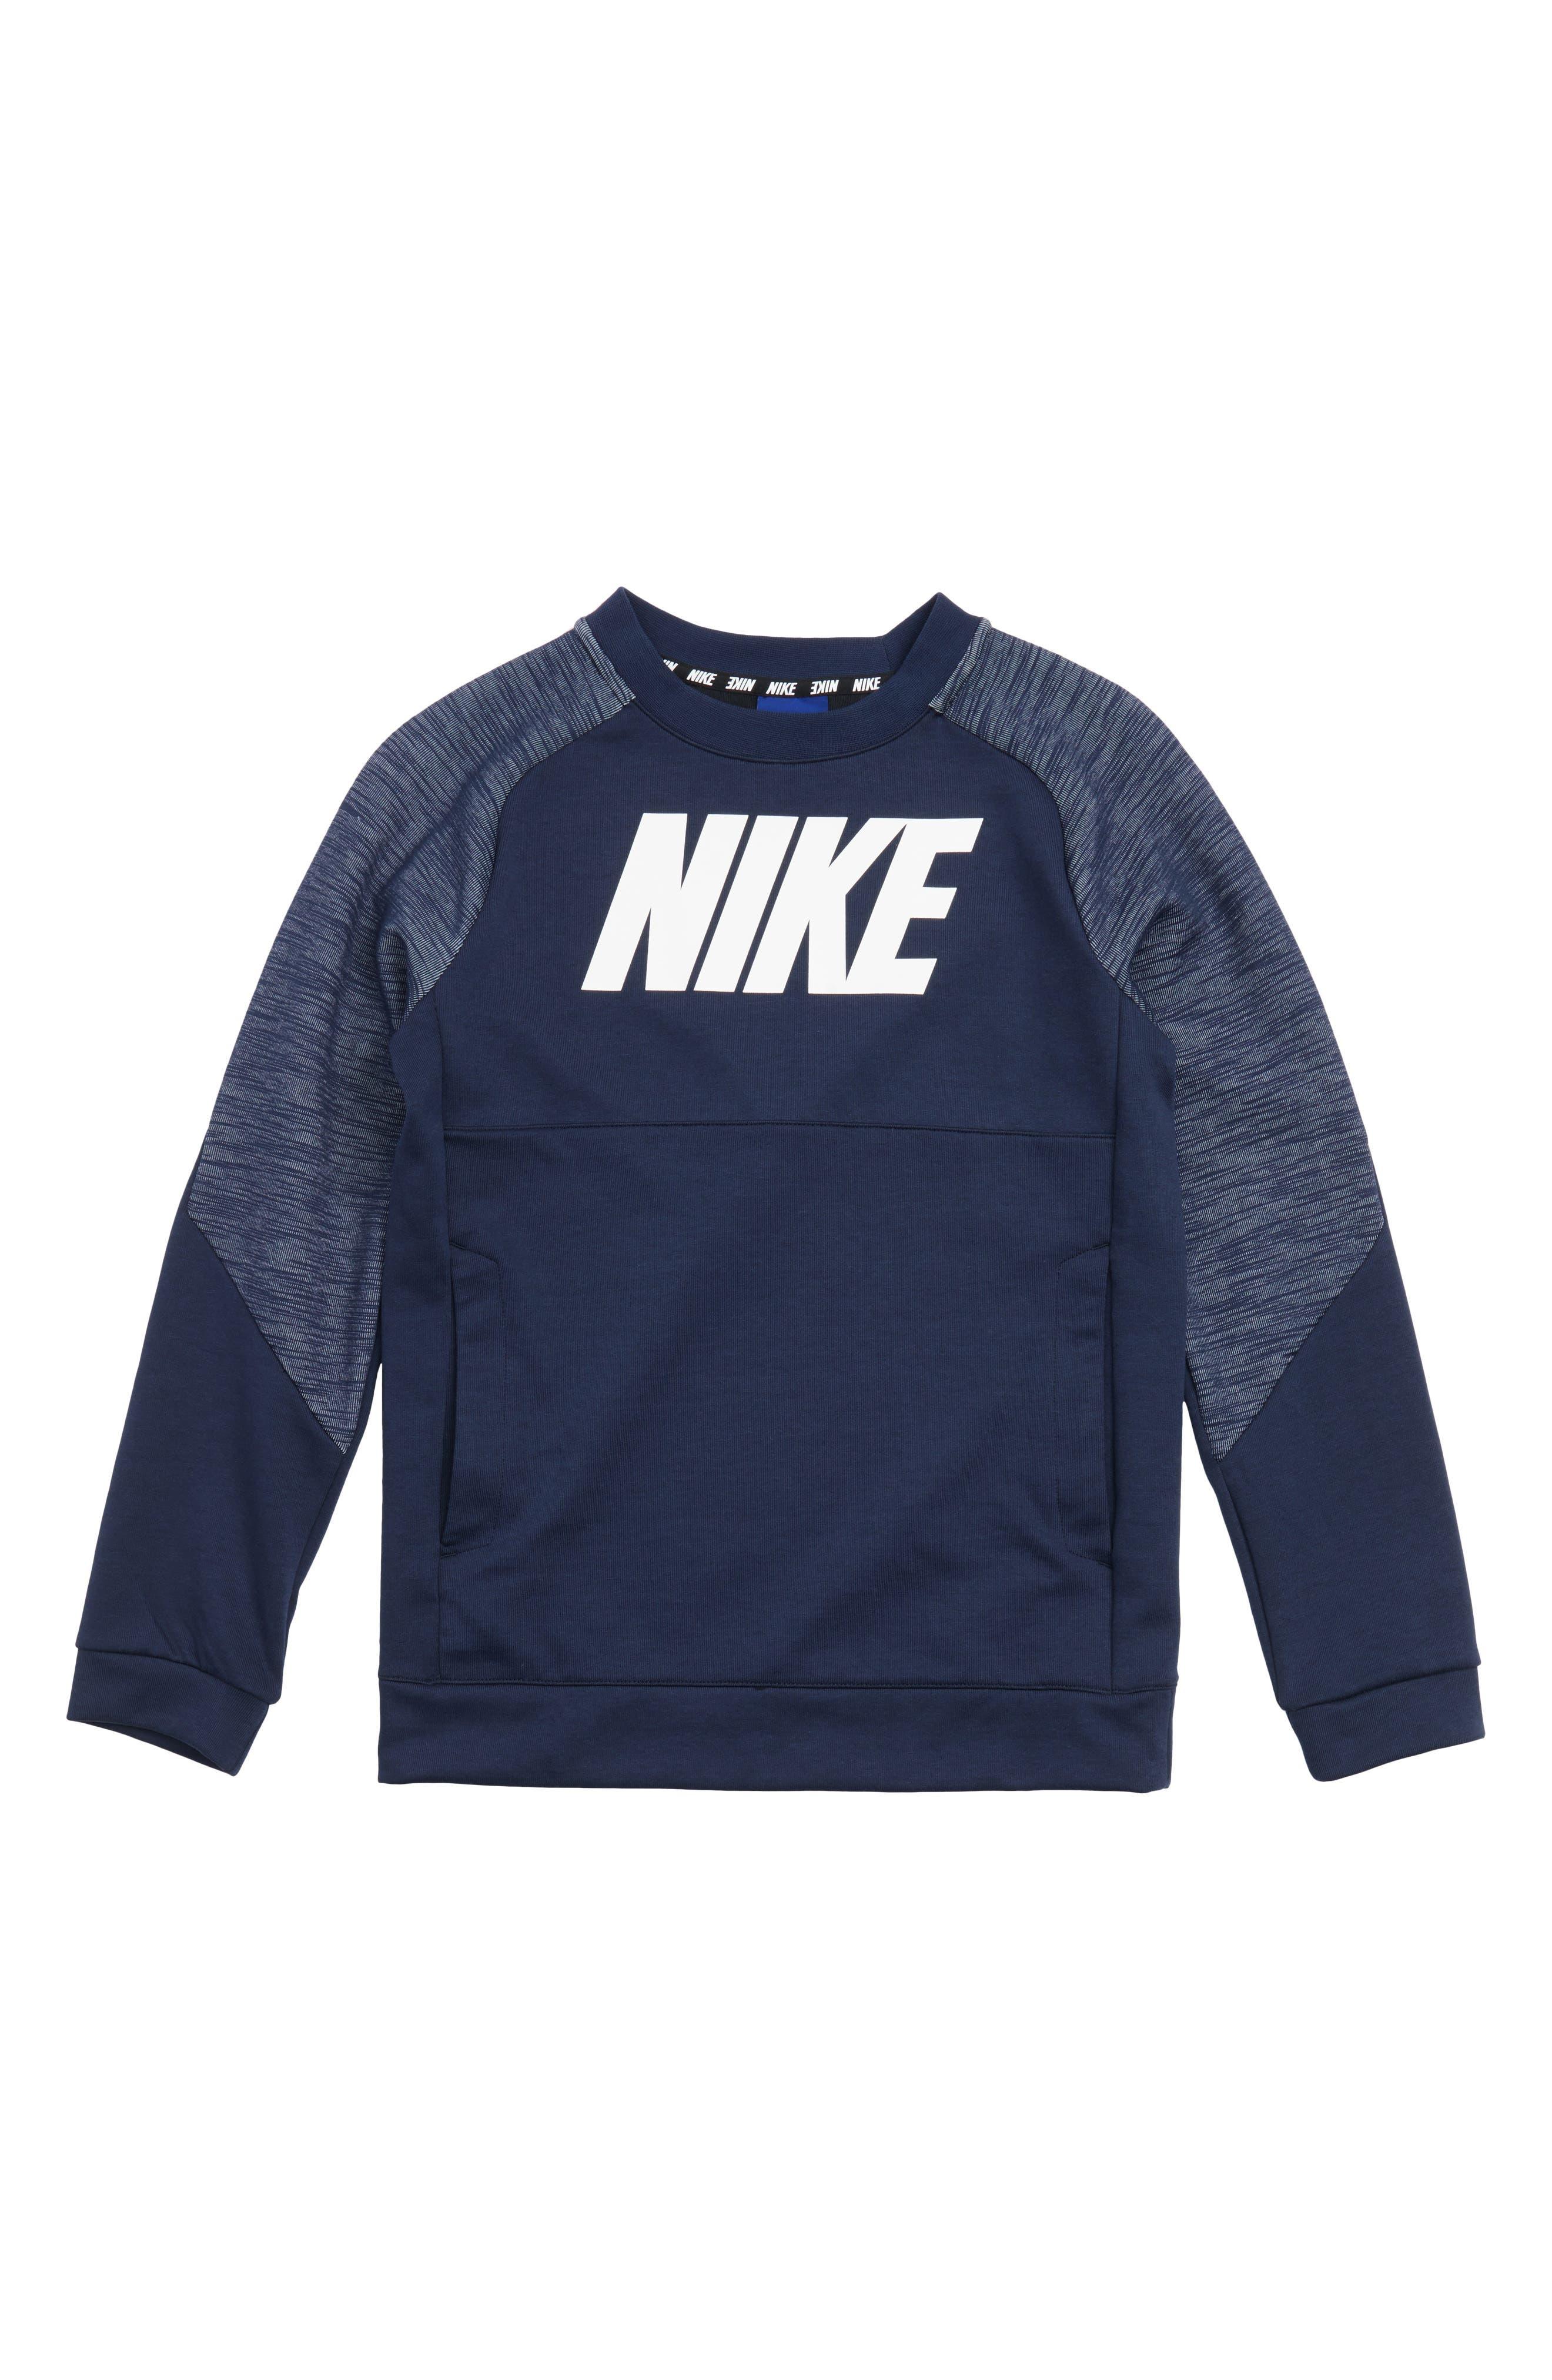 Alternate Image 1 Selected - Nike Colorblock Raglan Logo Sweatshirt (Little Boys & Big Boys)